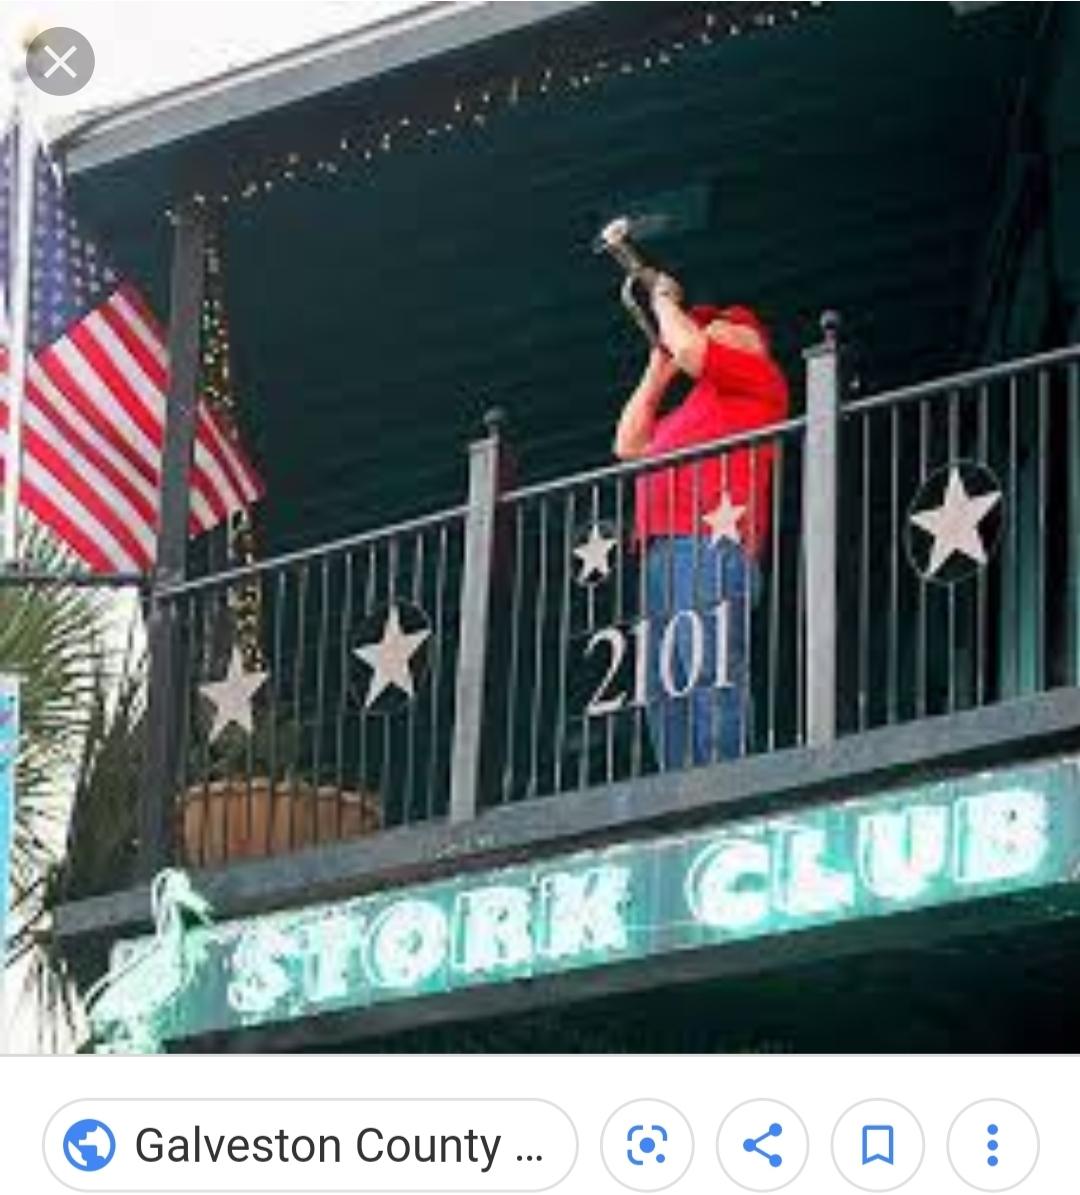 Courtesy of Galveston County News